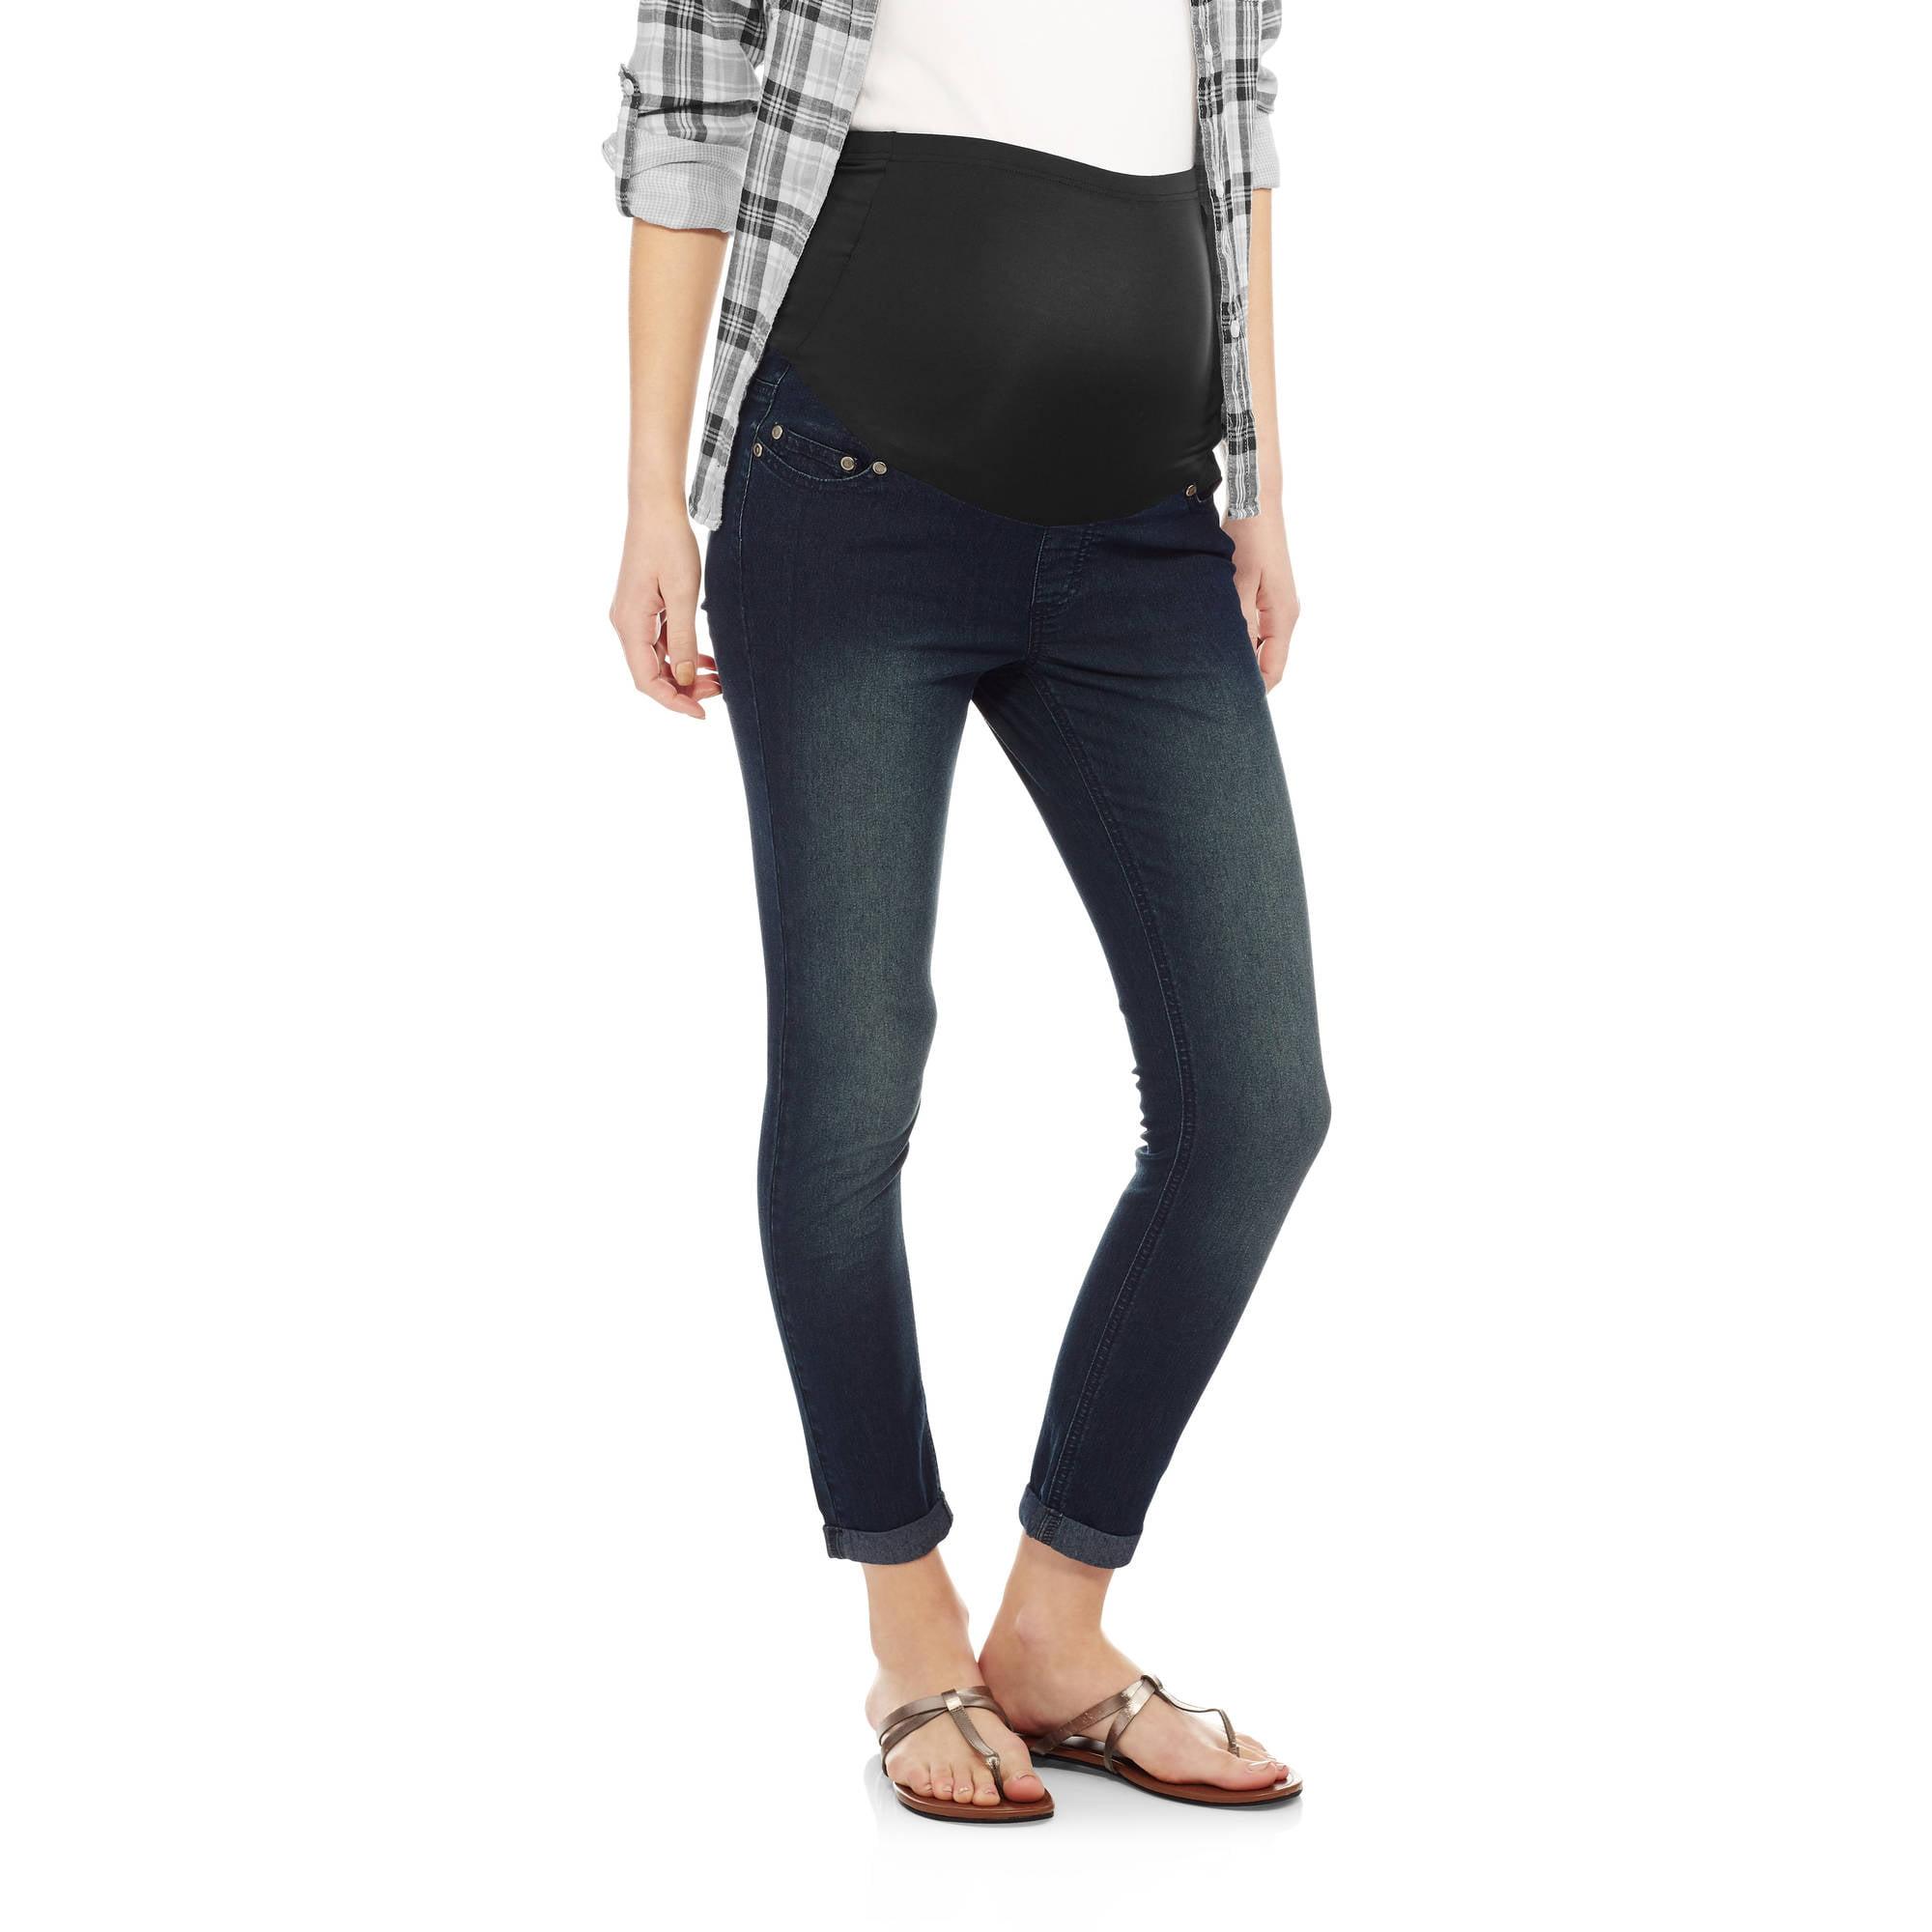 Oh Mamma Maternity Full Panel Super Soft Cuffed Skinny Boyfriend Crop Jeans